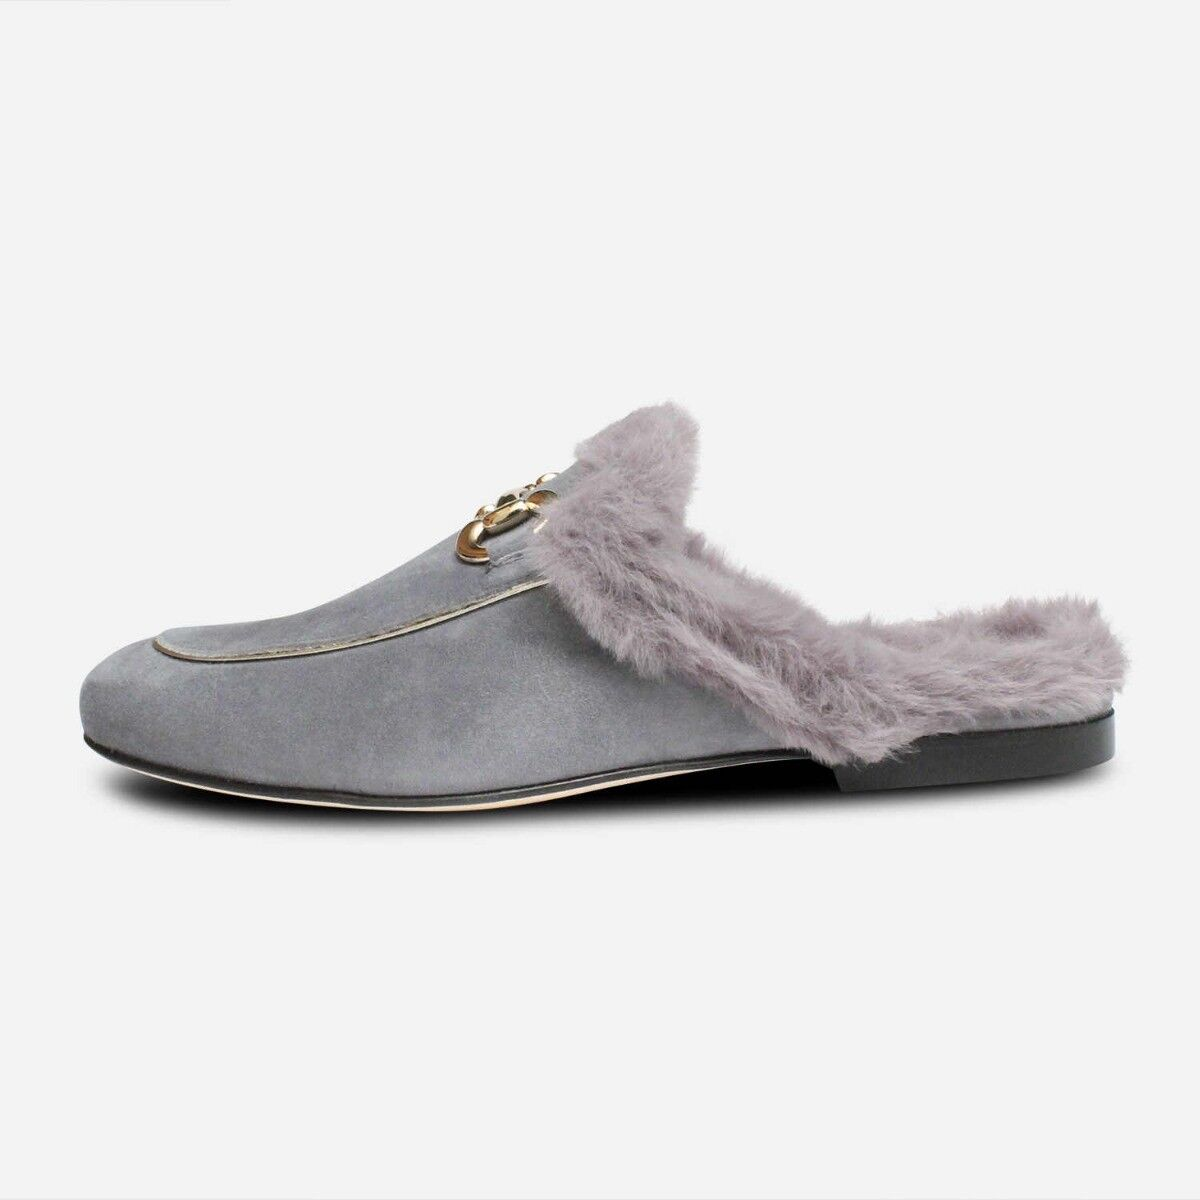 Excellent quality Damen Plattform Schuhe Sommer Halbschuhe